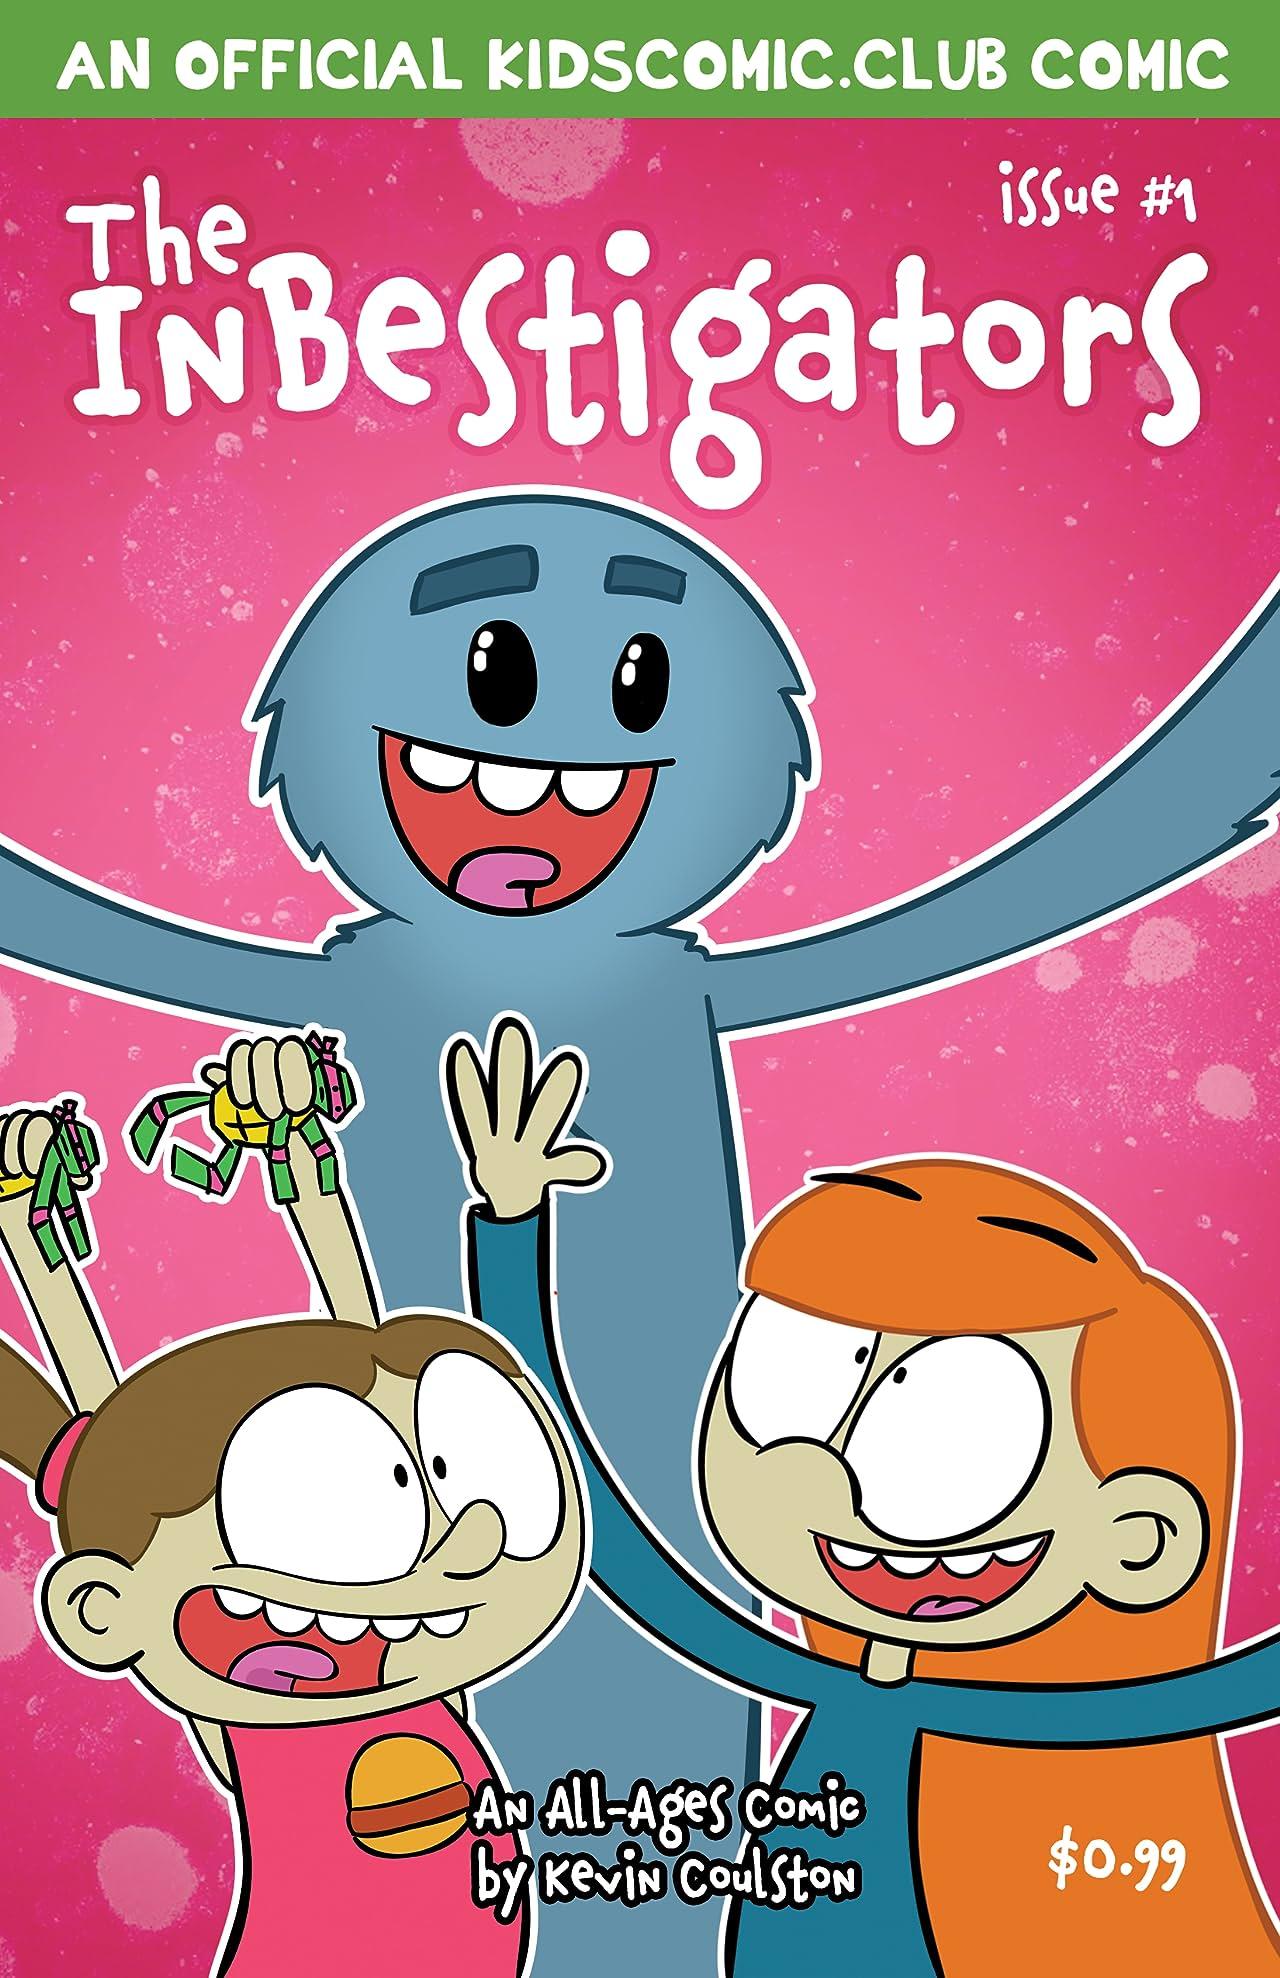 The InBestigators #1